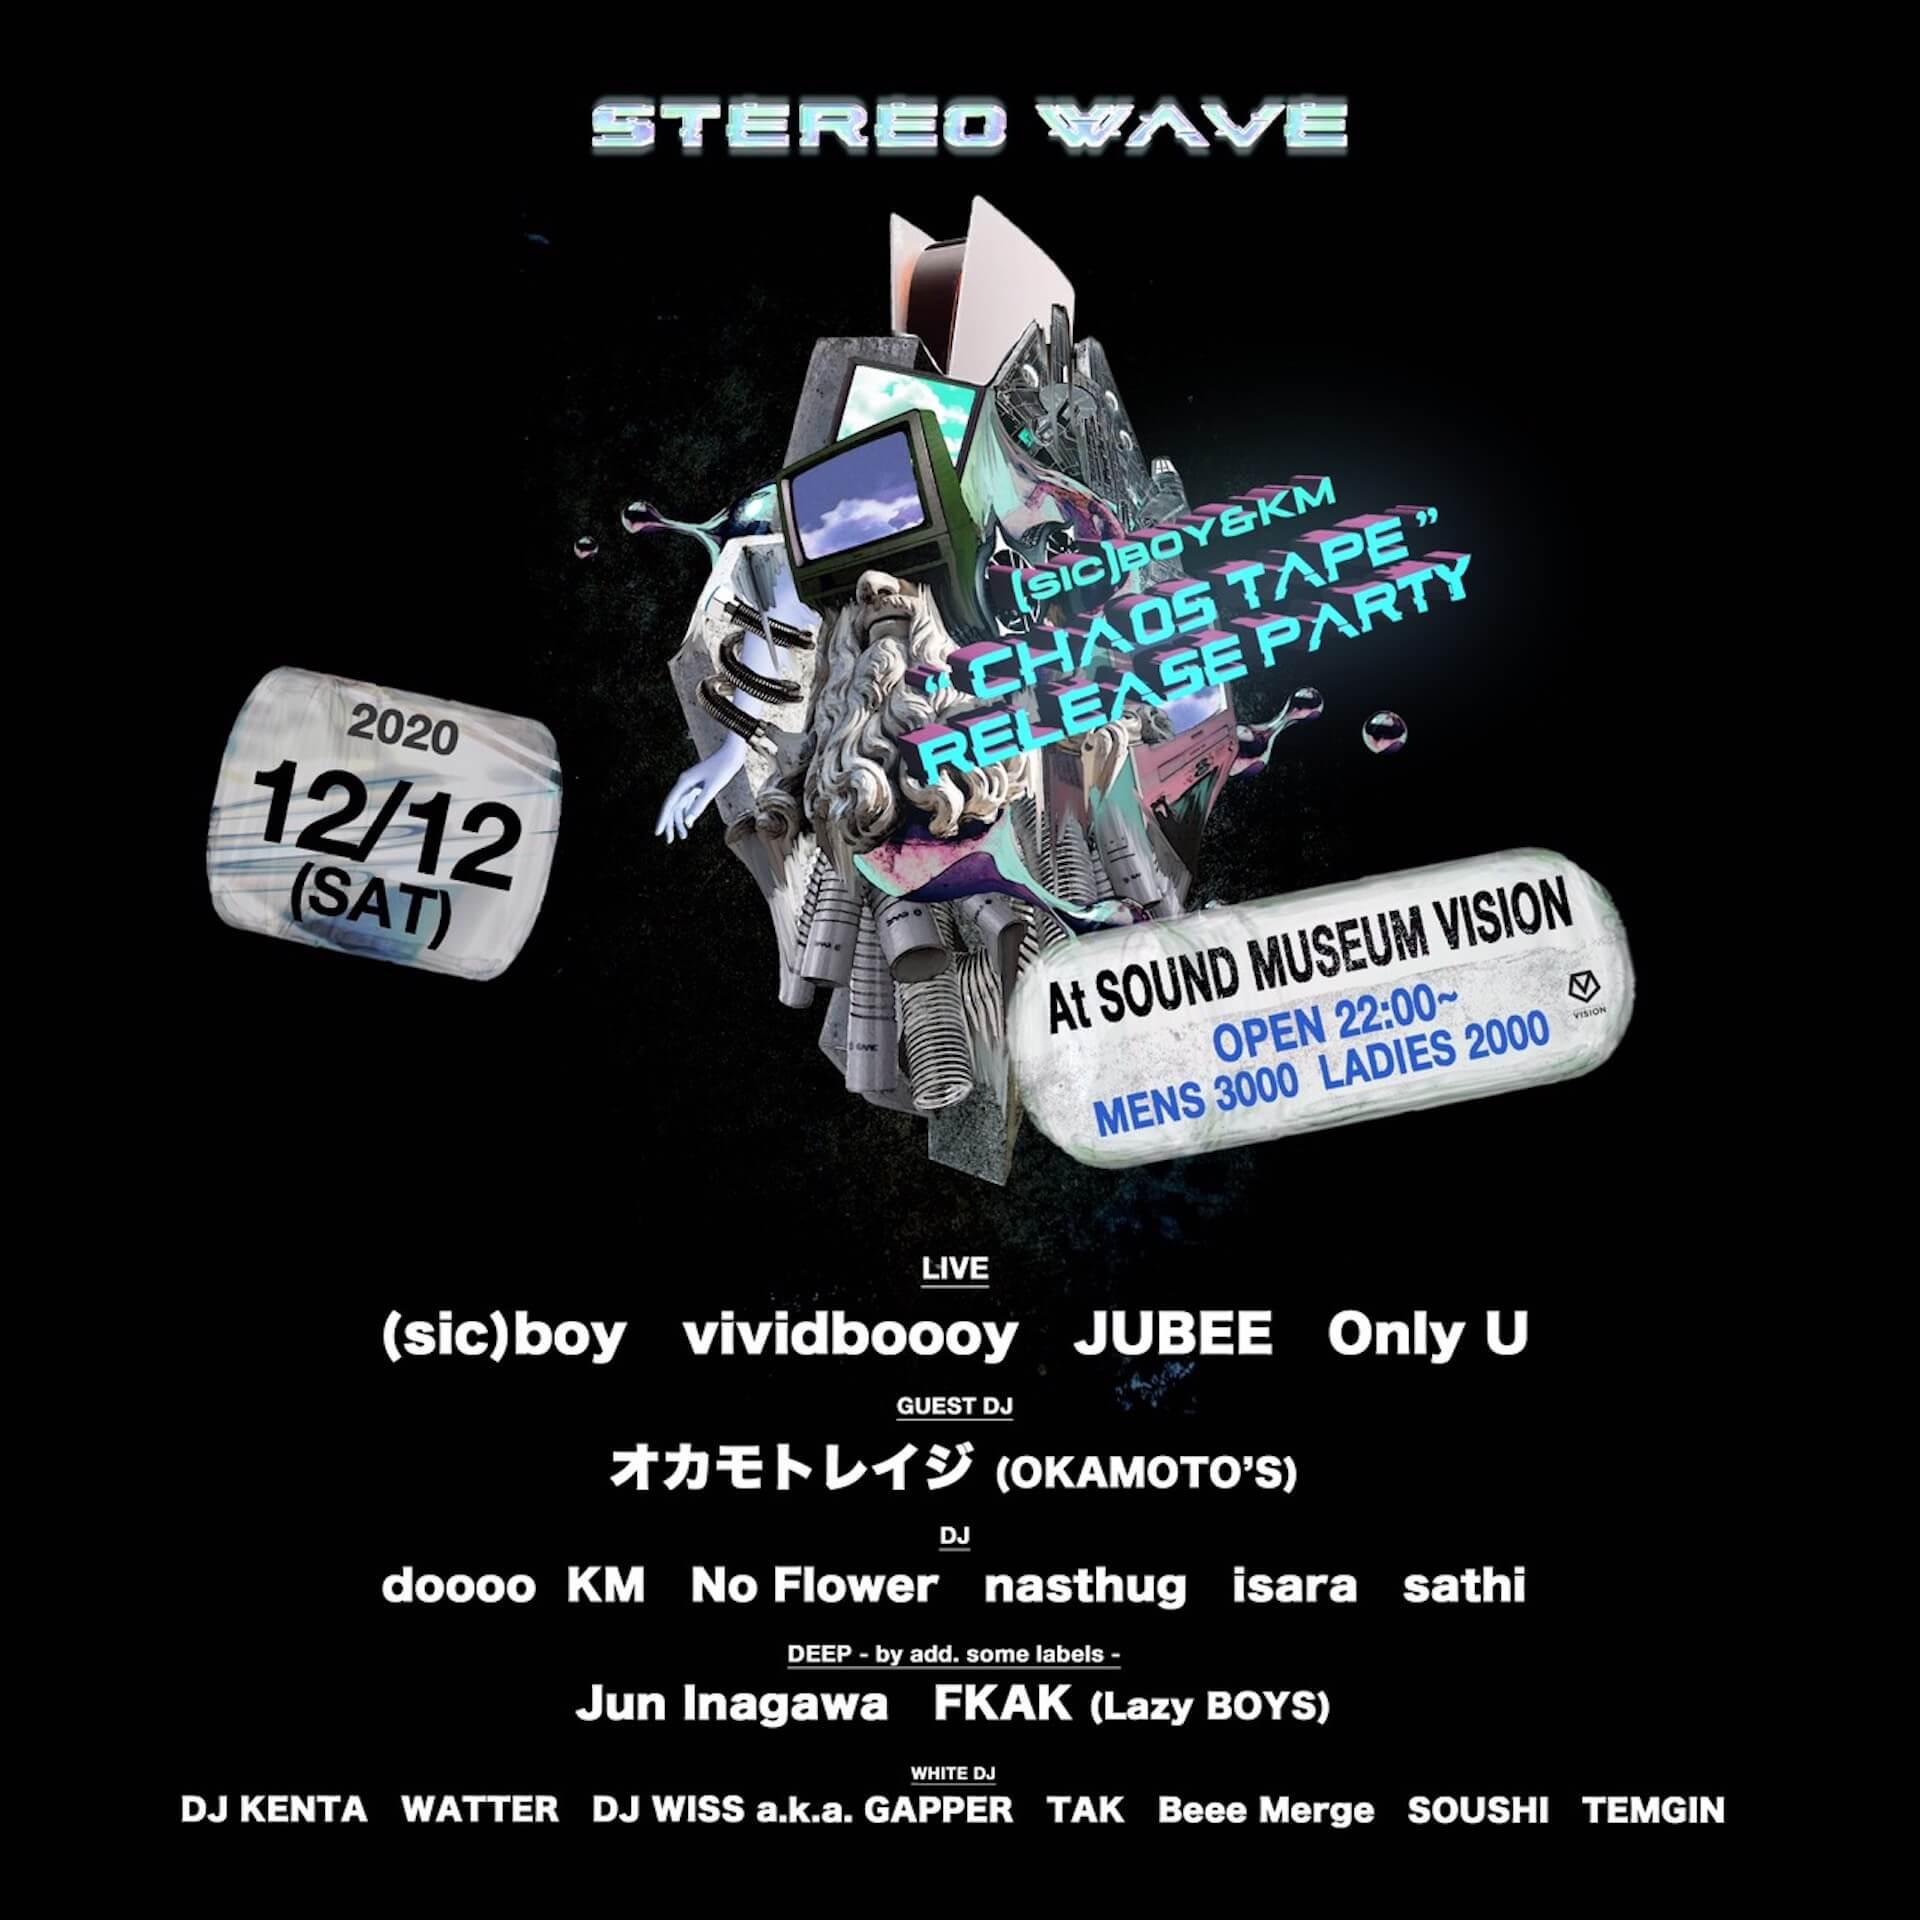 (sic)boyとKMのコラボアルバム『CHAOS TAPE』リリースパーティーが開催決定!ゲストにvividboooy、JUBEE、オカモトレイジら music20121_chaostape_releaseparty_1